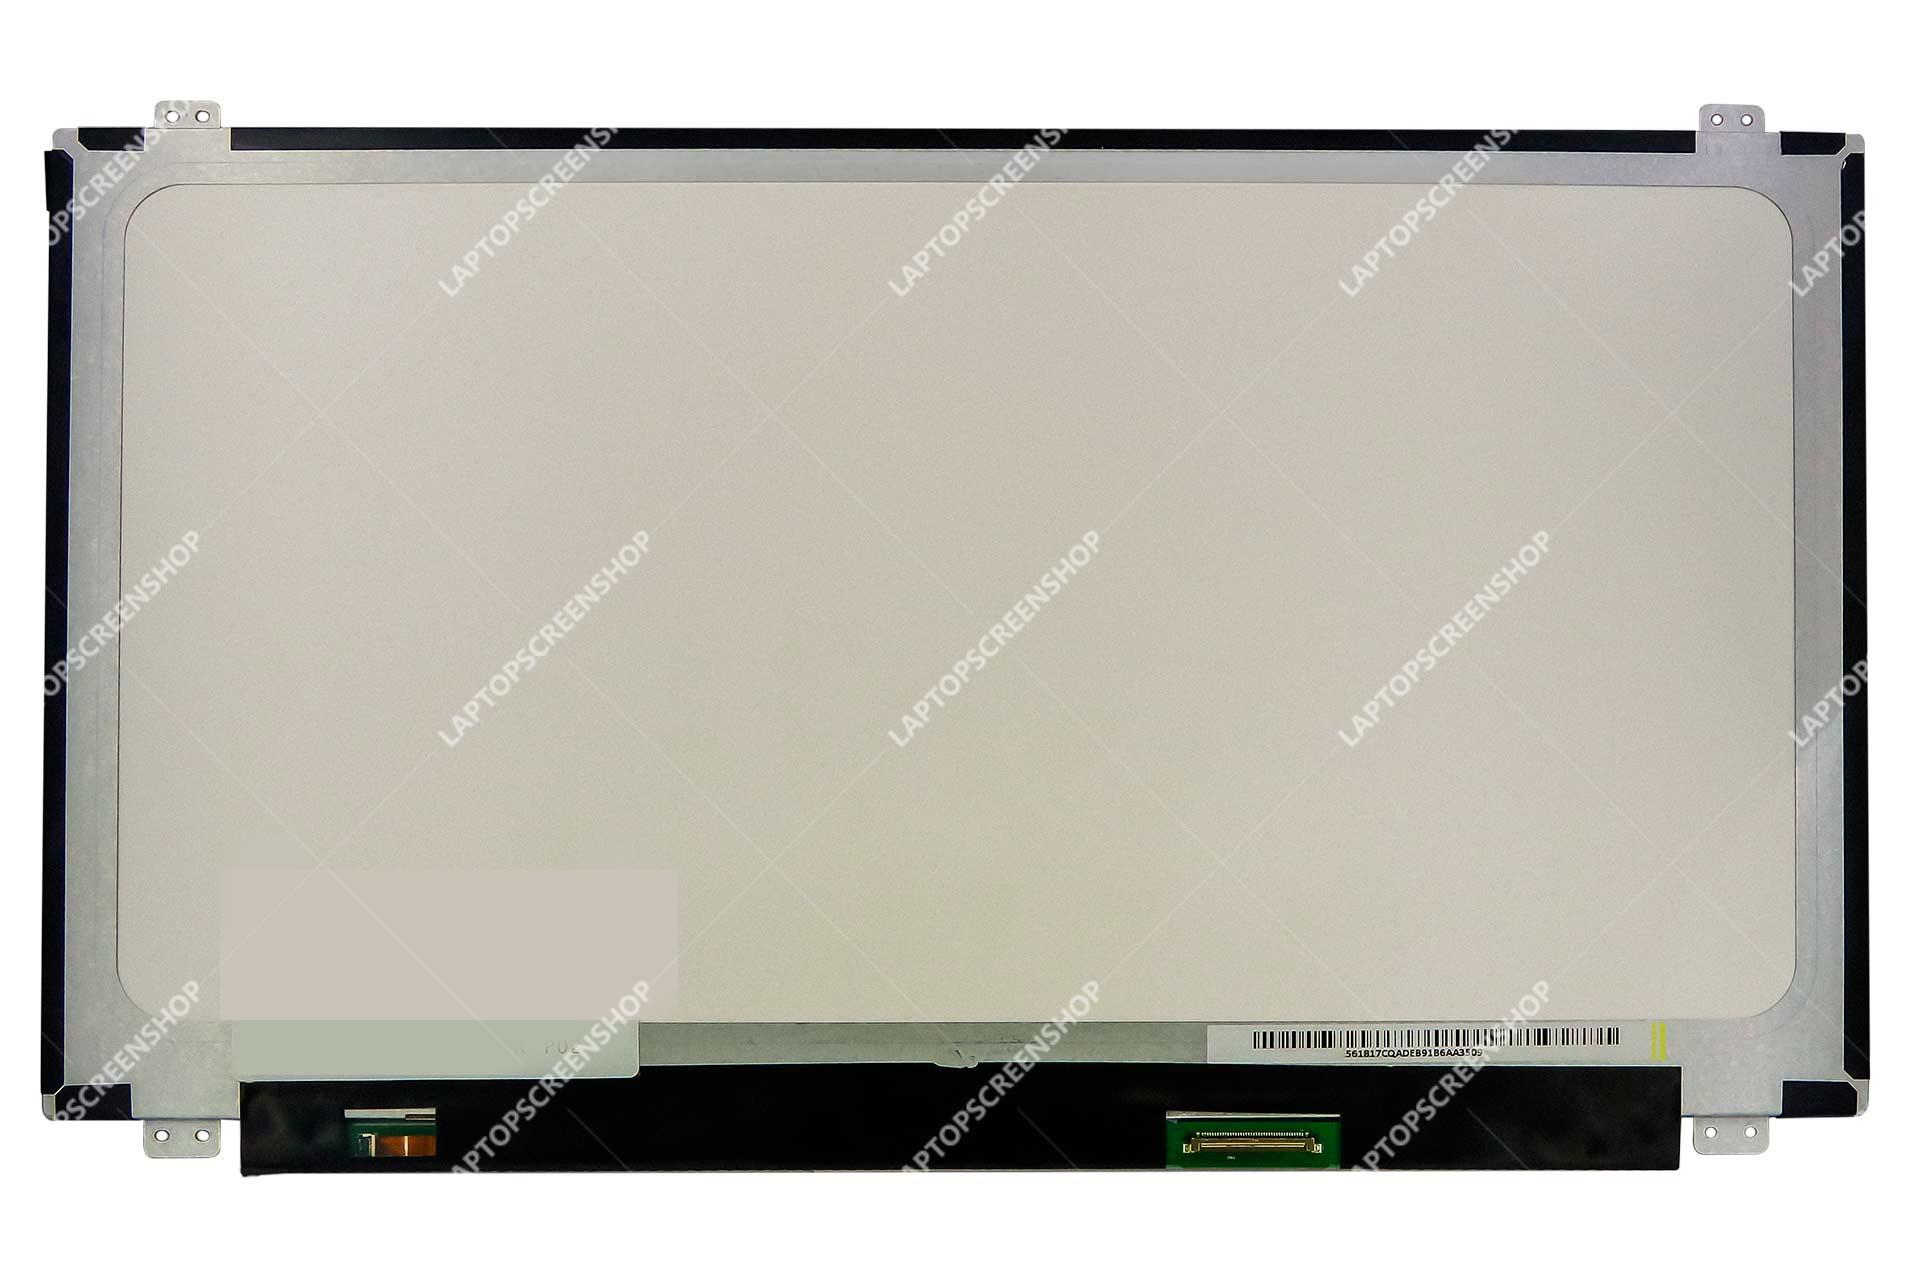 SONY-VAIO-SVS15117FDB-LCD |FHD|فروشگاه لپ تاپ اسکرين | تعمير لپ تاپ